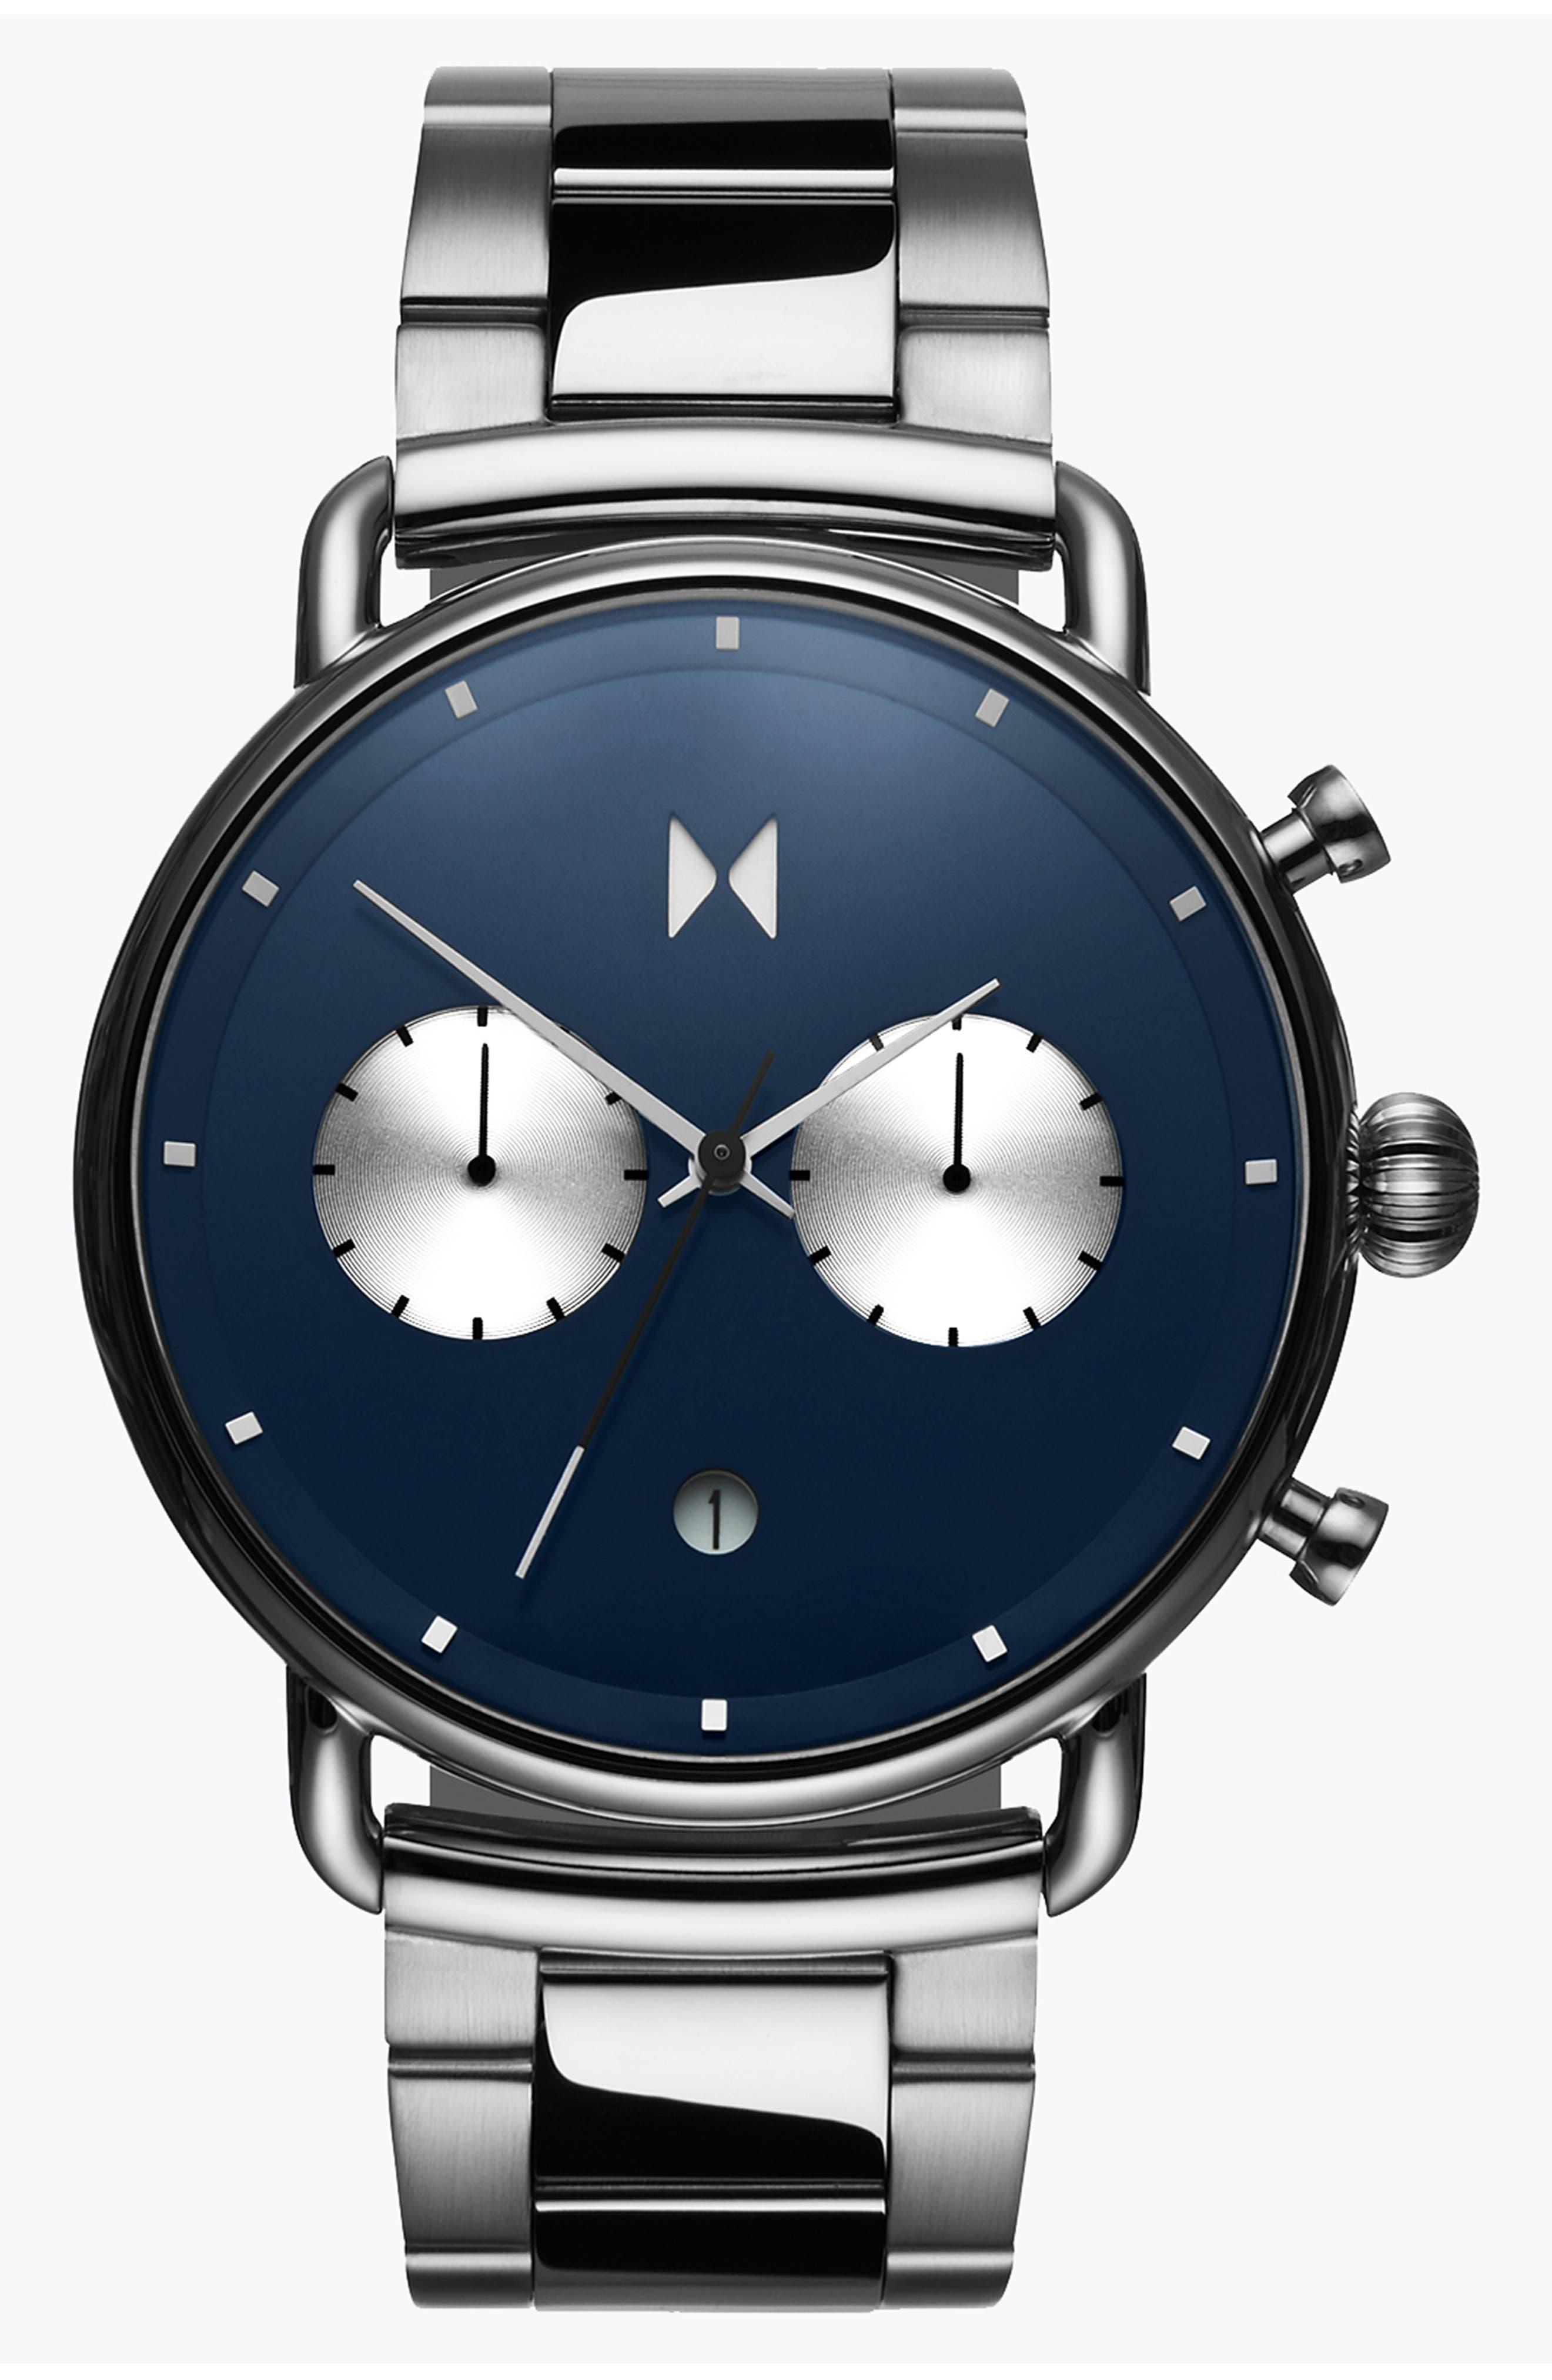 Blacktop Chronograph Bracelet Watch,                             Main thumbnail 1, color,                             BLUE/ SILVER